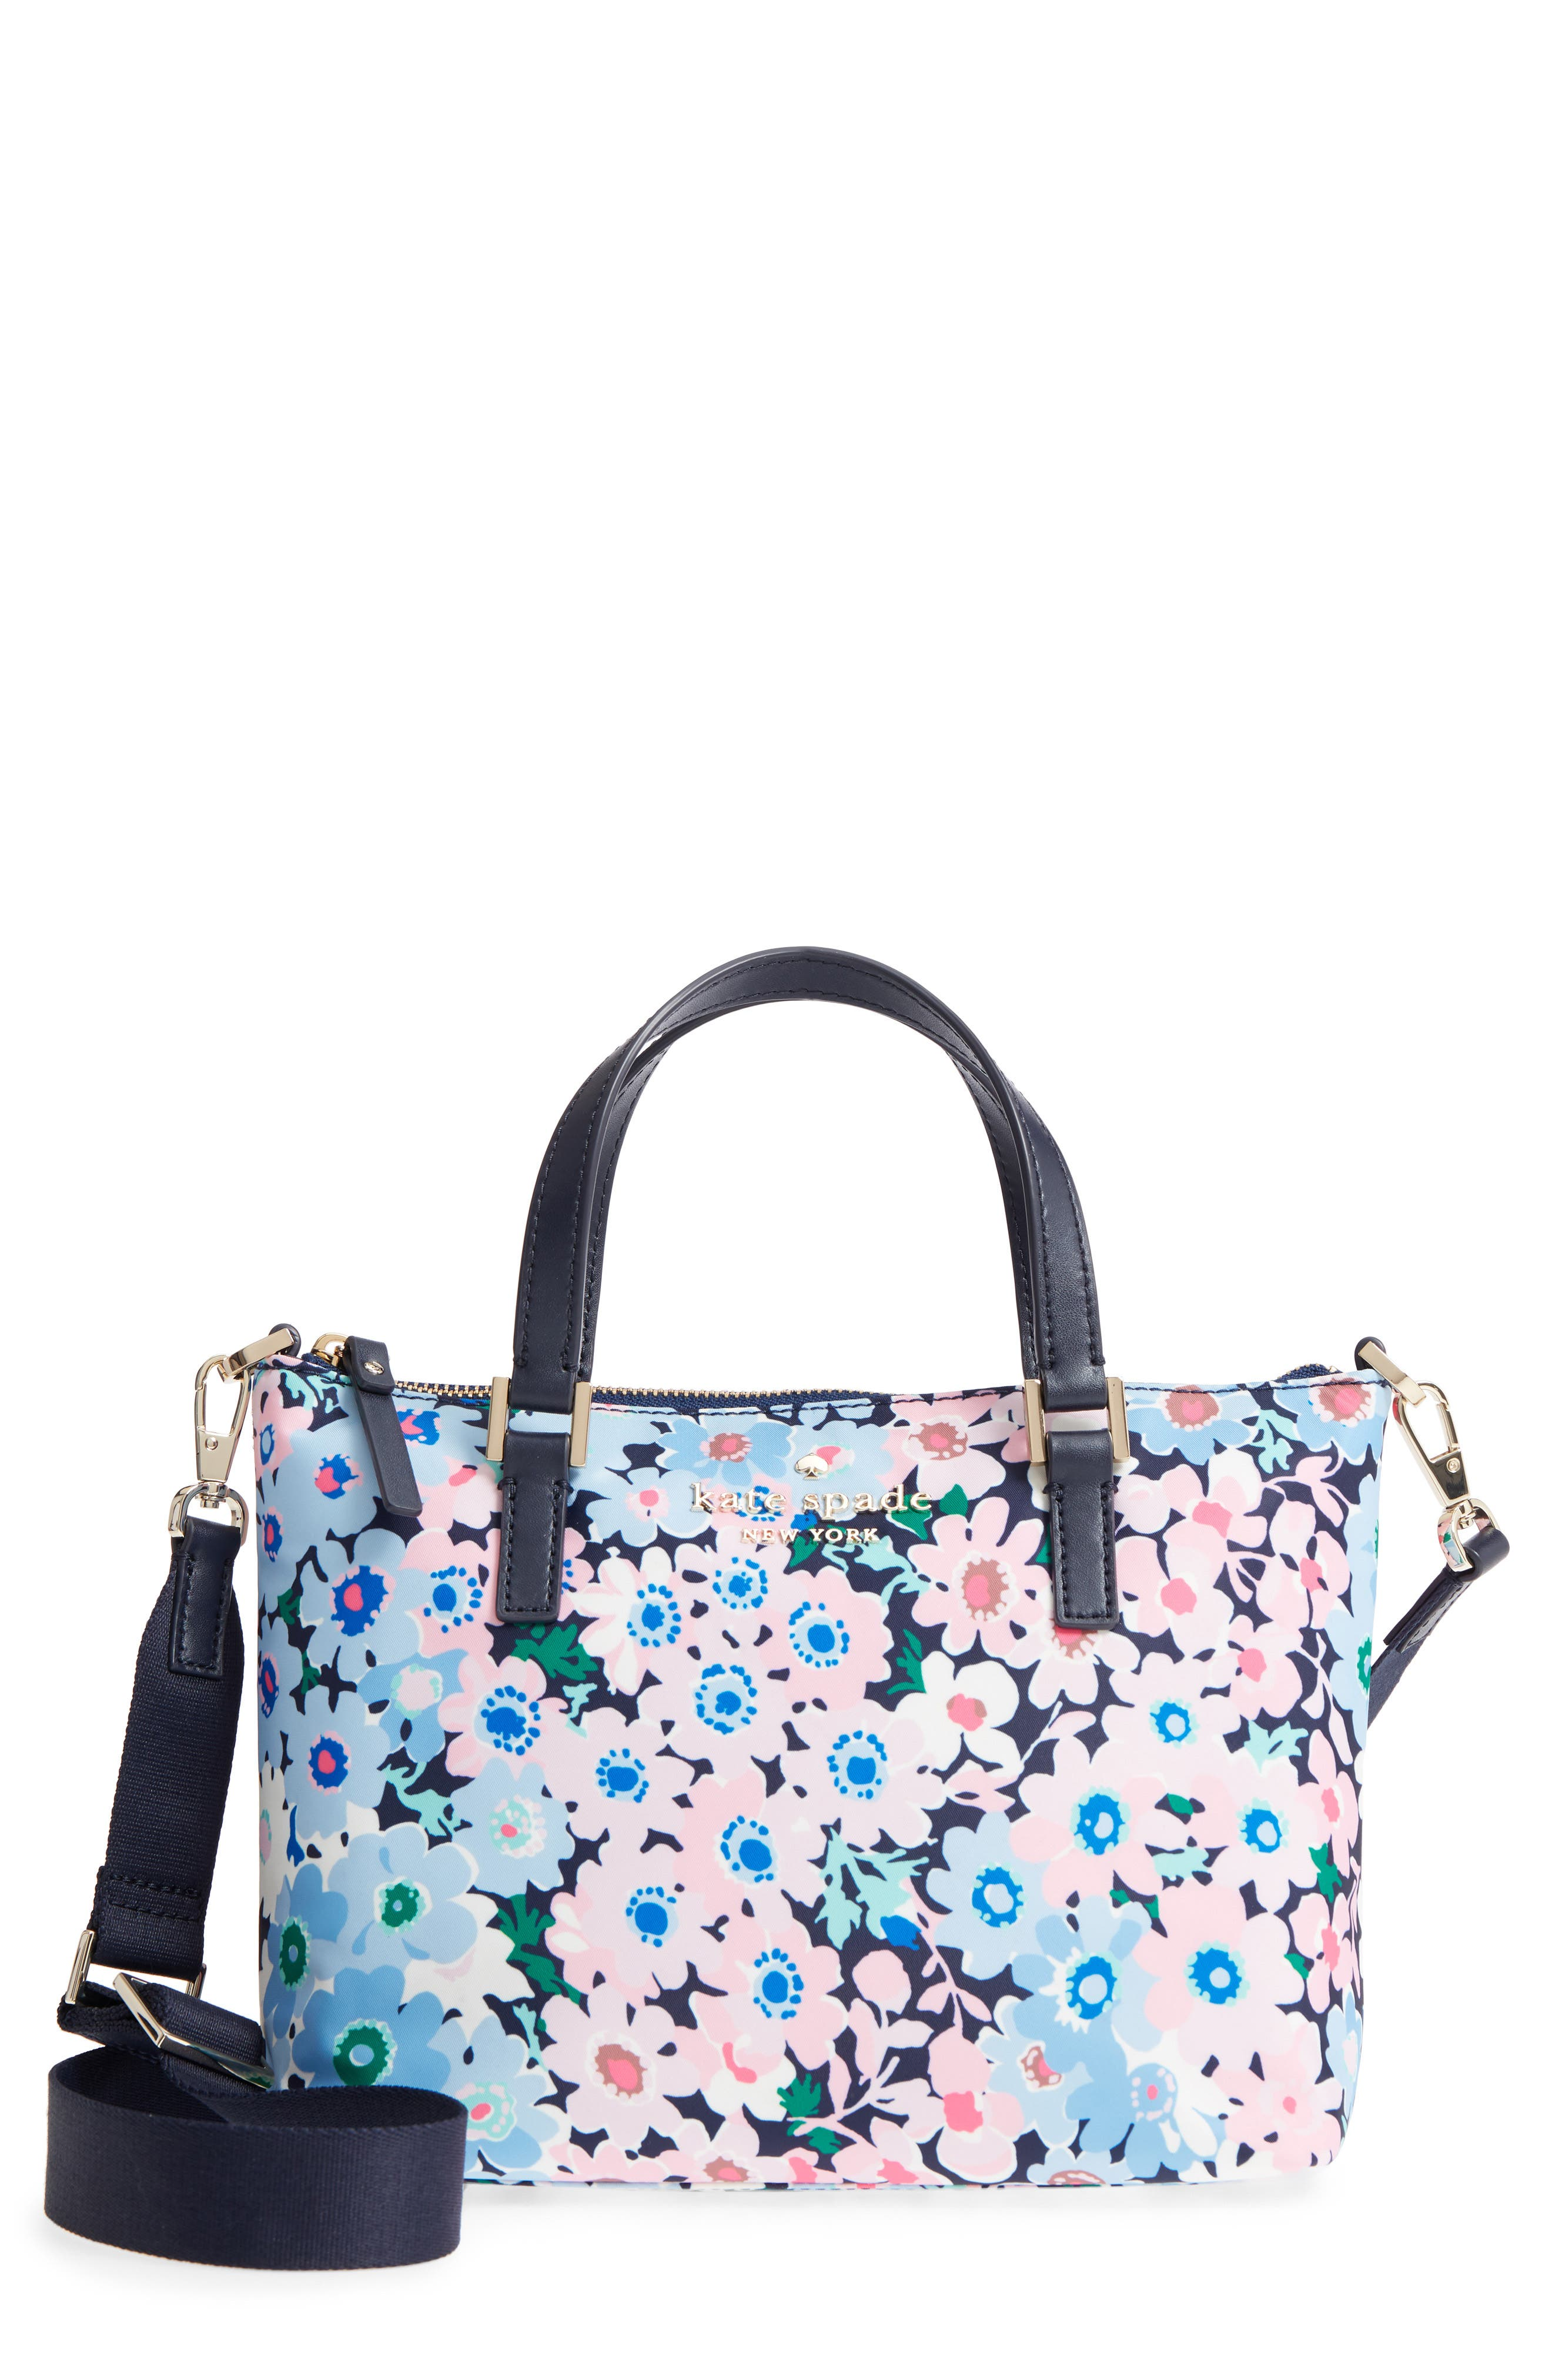 watson lane - daisy garden lucie crossbody bag,                             Main thumbnail 1, color,                             Blue Multi